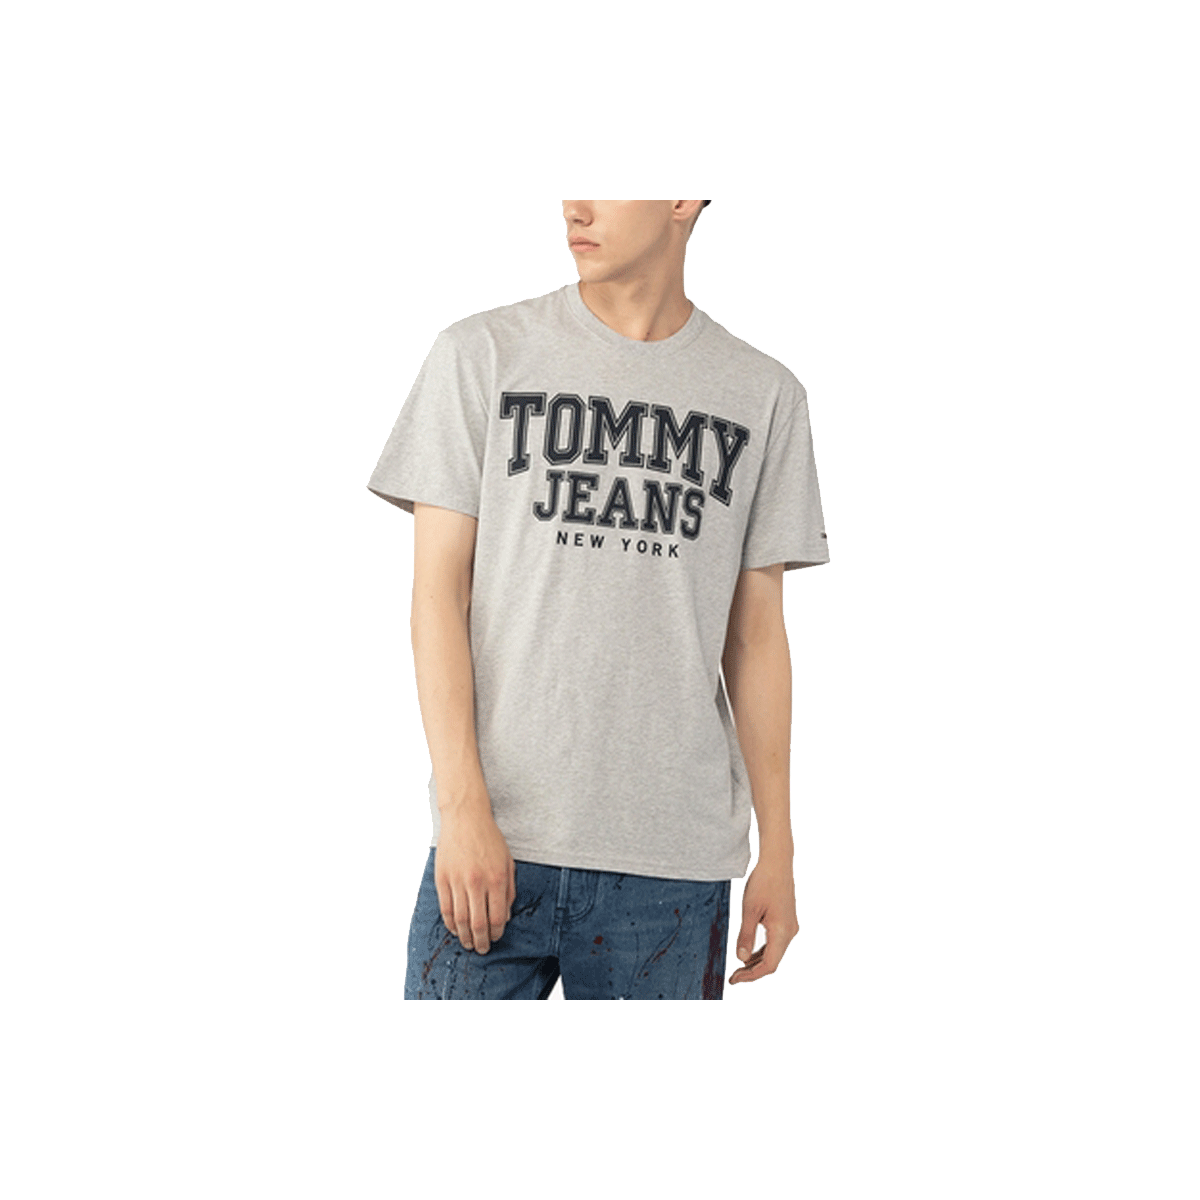 ff6bfa5e35ecb TShirt Col Rond Homme Tommy Hilfiger College New York Gris DM0DM05113